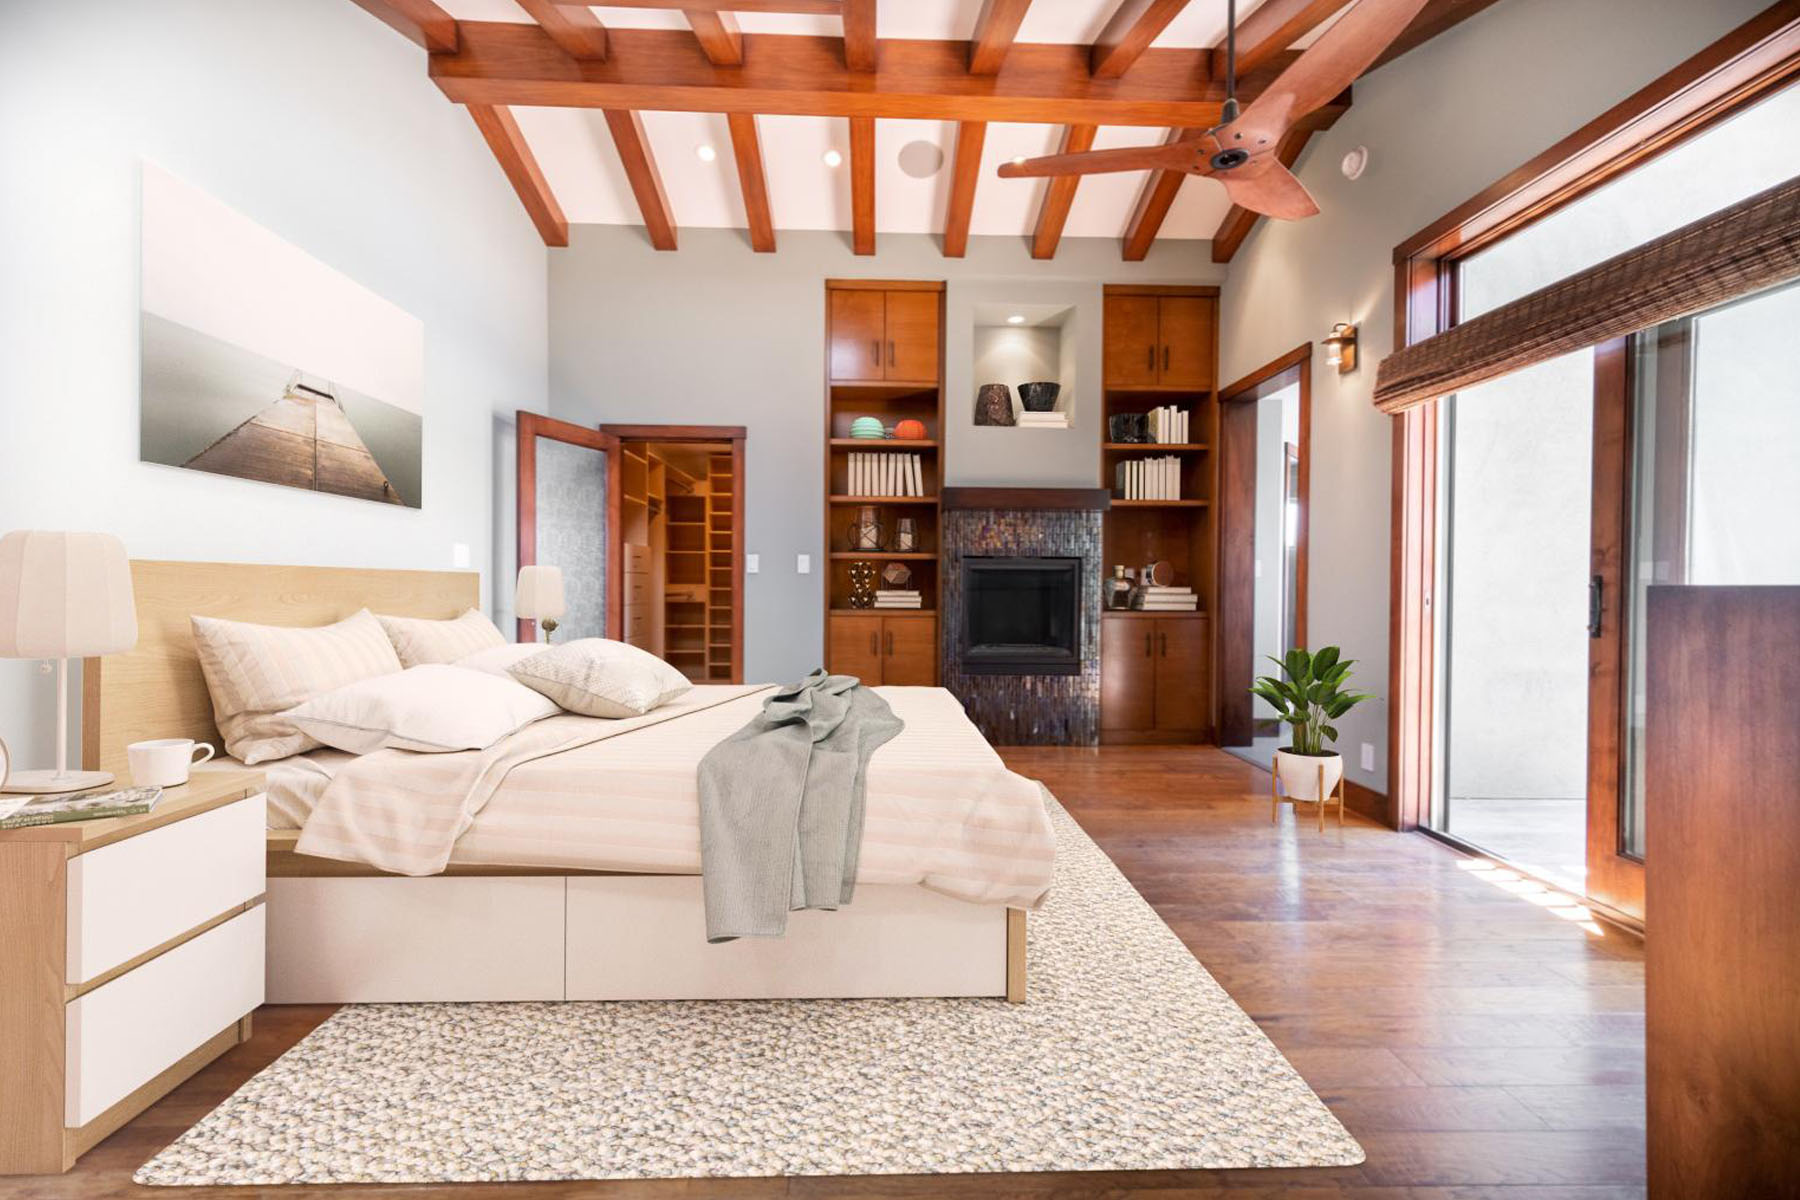 Strand home bedroom; Silver Strand, CA